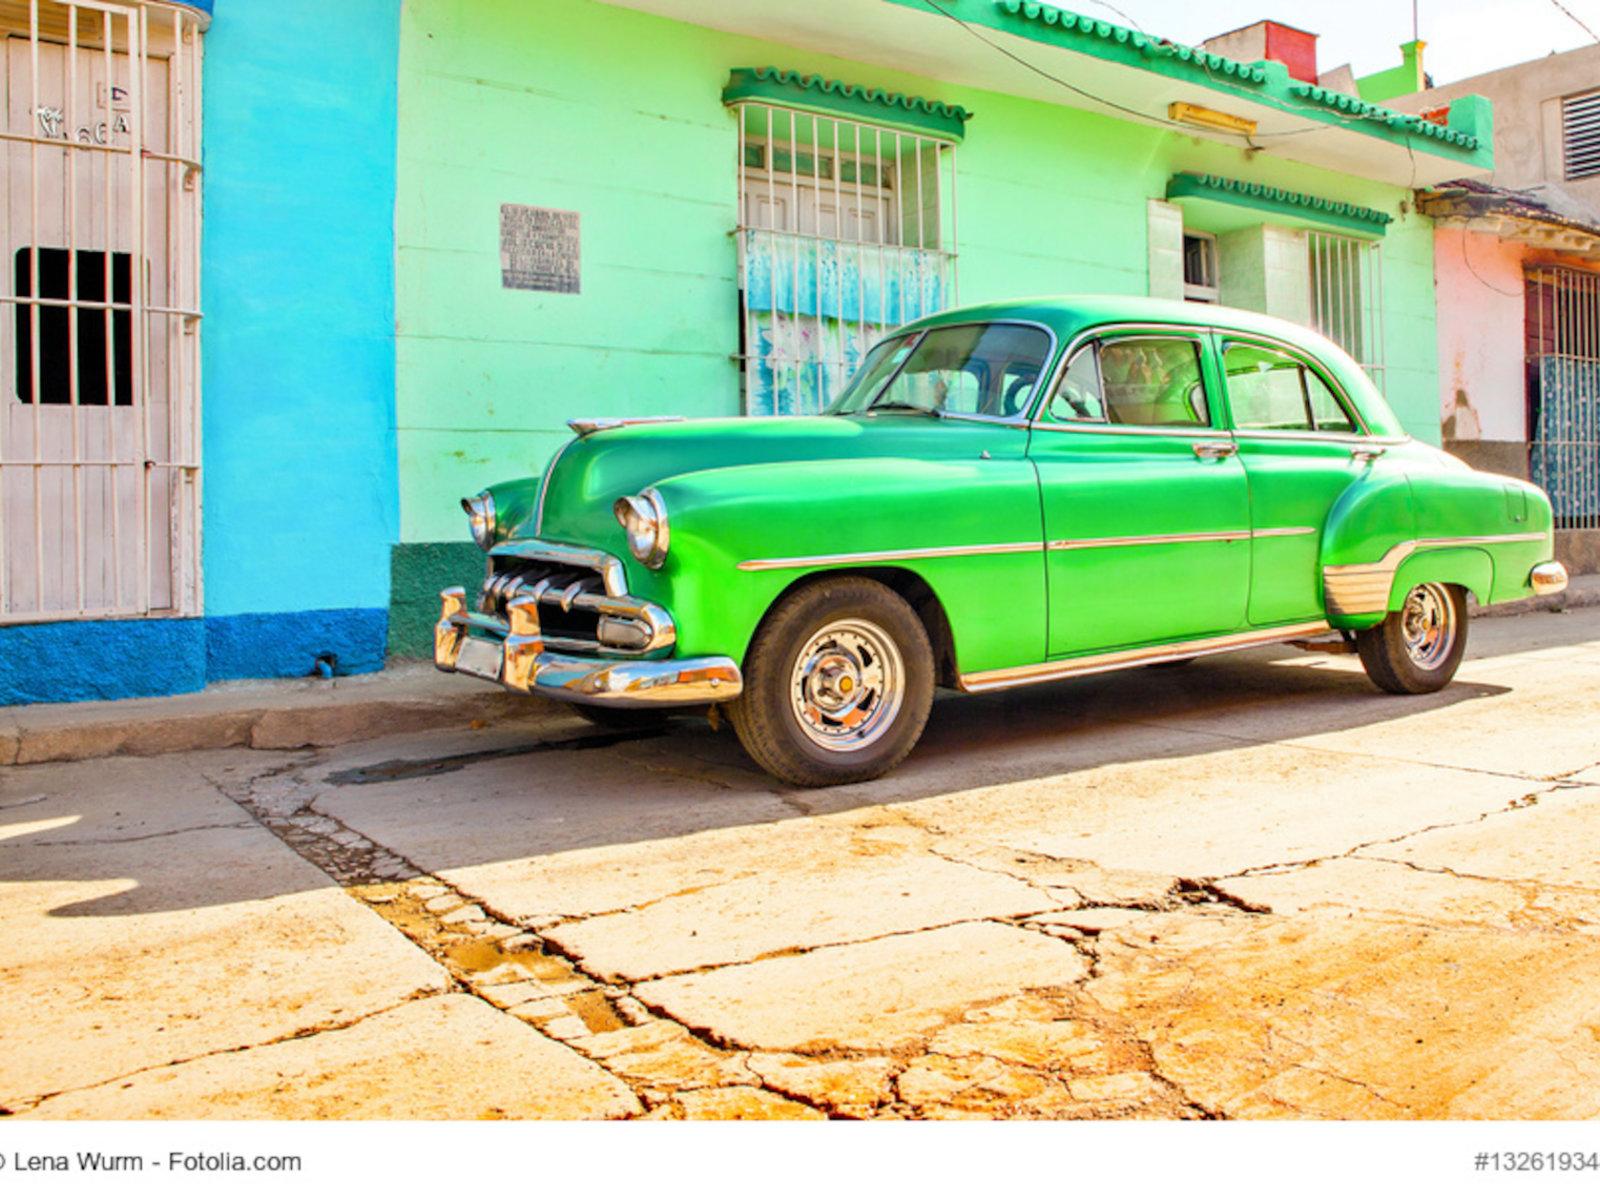 Trinidad©Lena Wurm-Fotolia.com